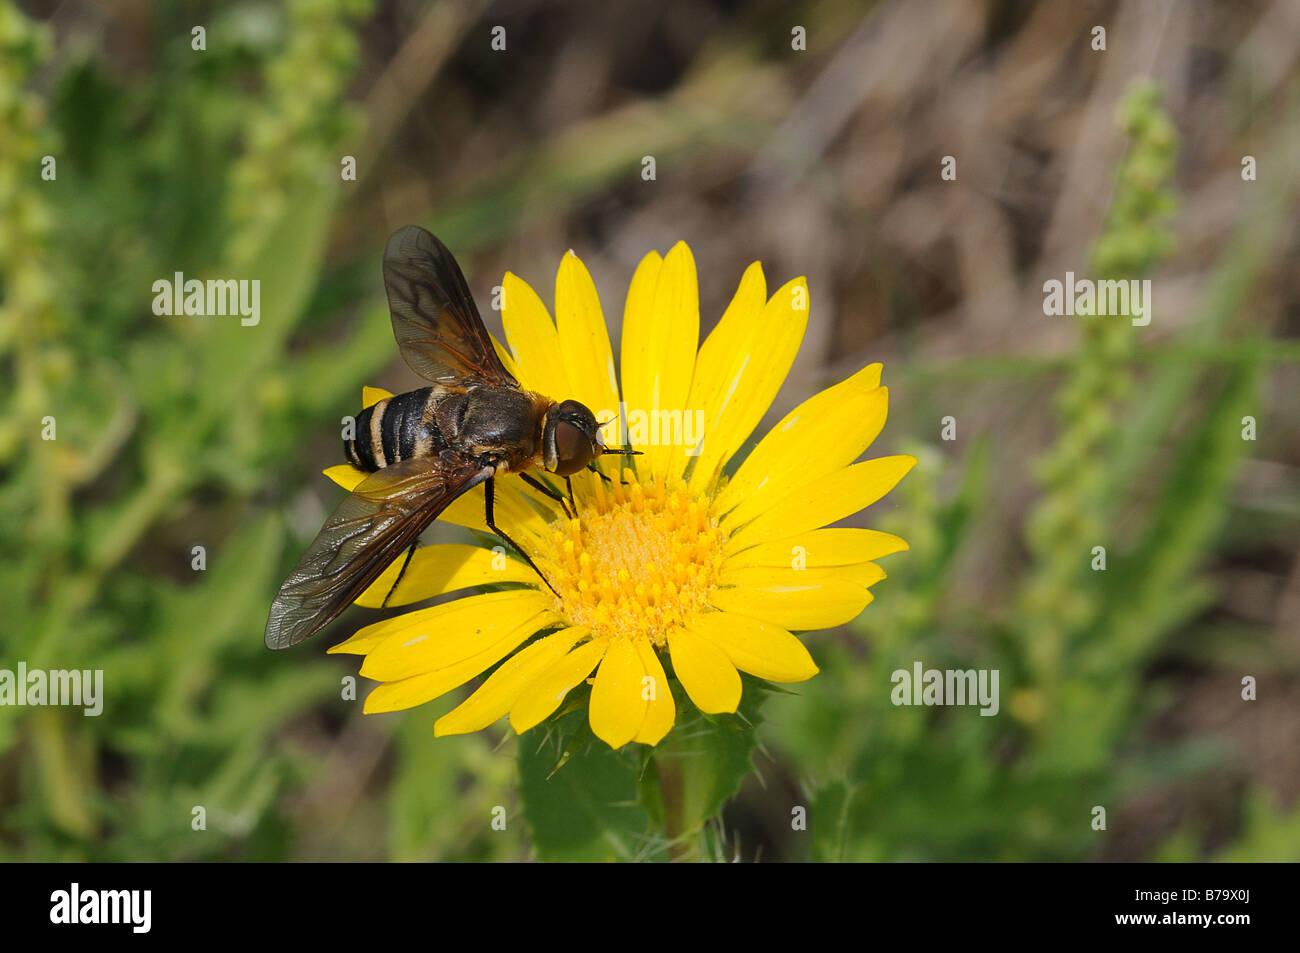 Progressive Bee Fly feeding on a Saw Leaf Daisy wildflower - Stock Image